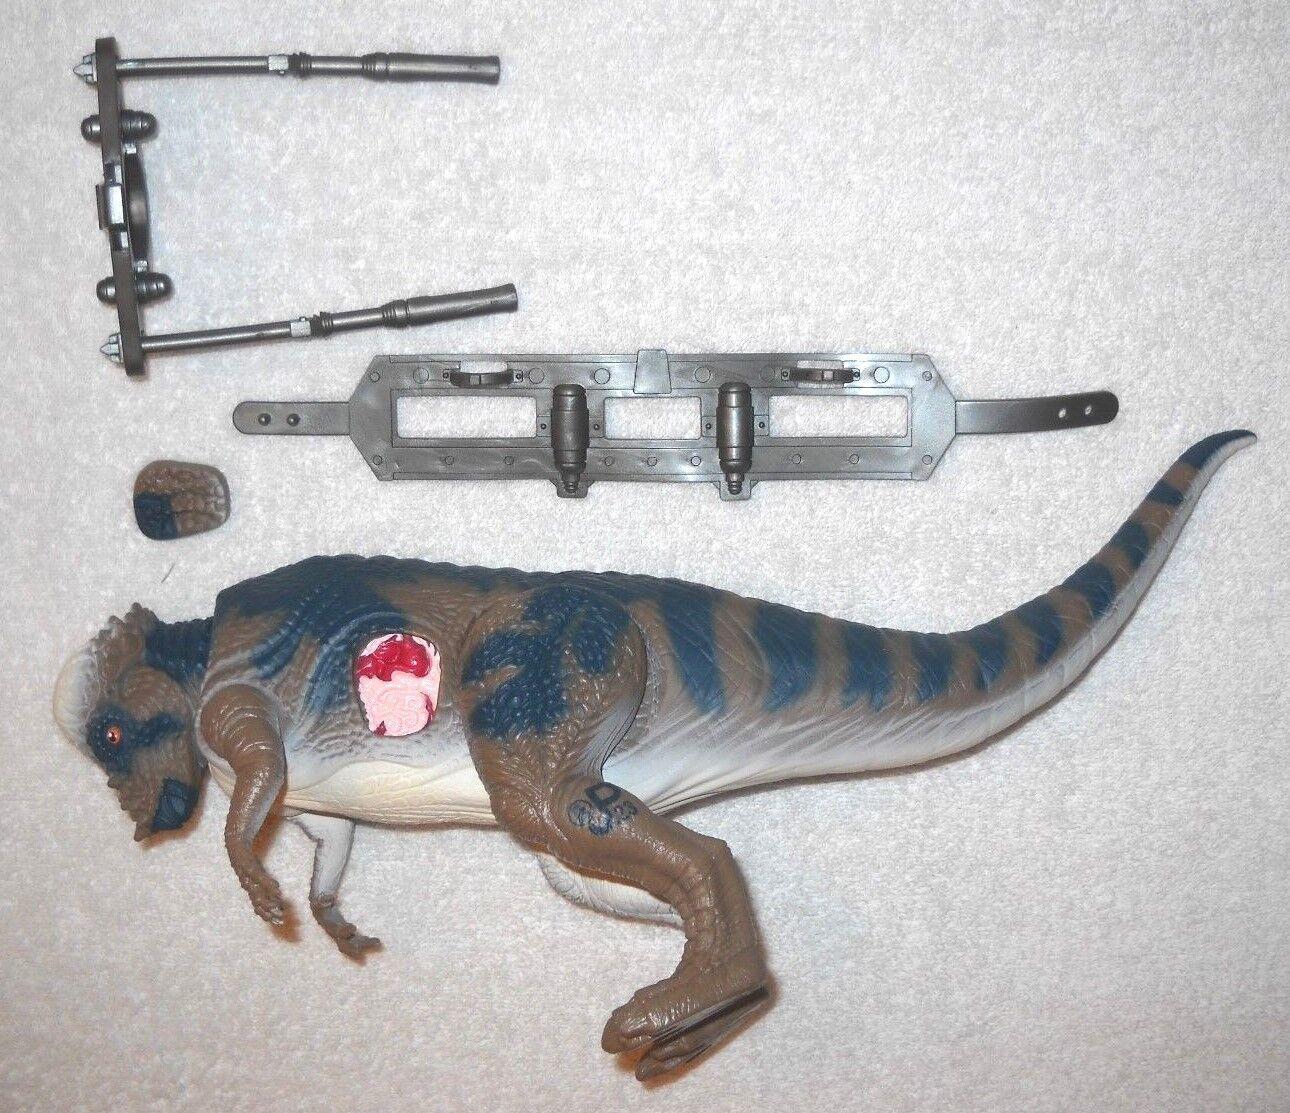 Jurassic Park  Lost World - Pachycephalosaurus (JP23) - 100% 100% 100% complete (Hasbro) b41729